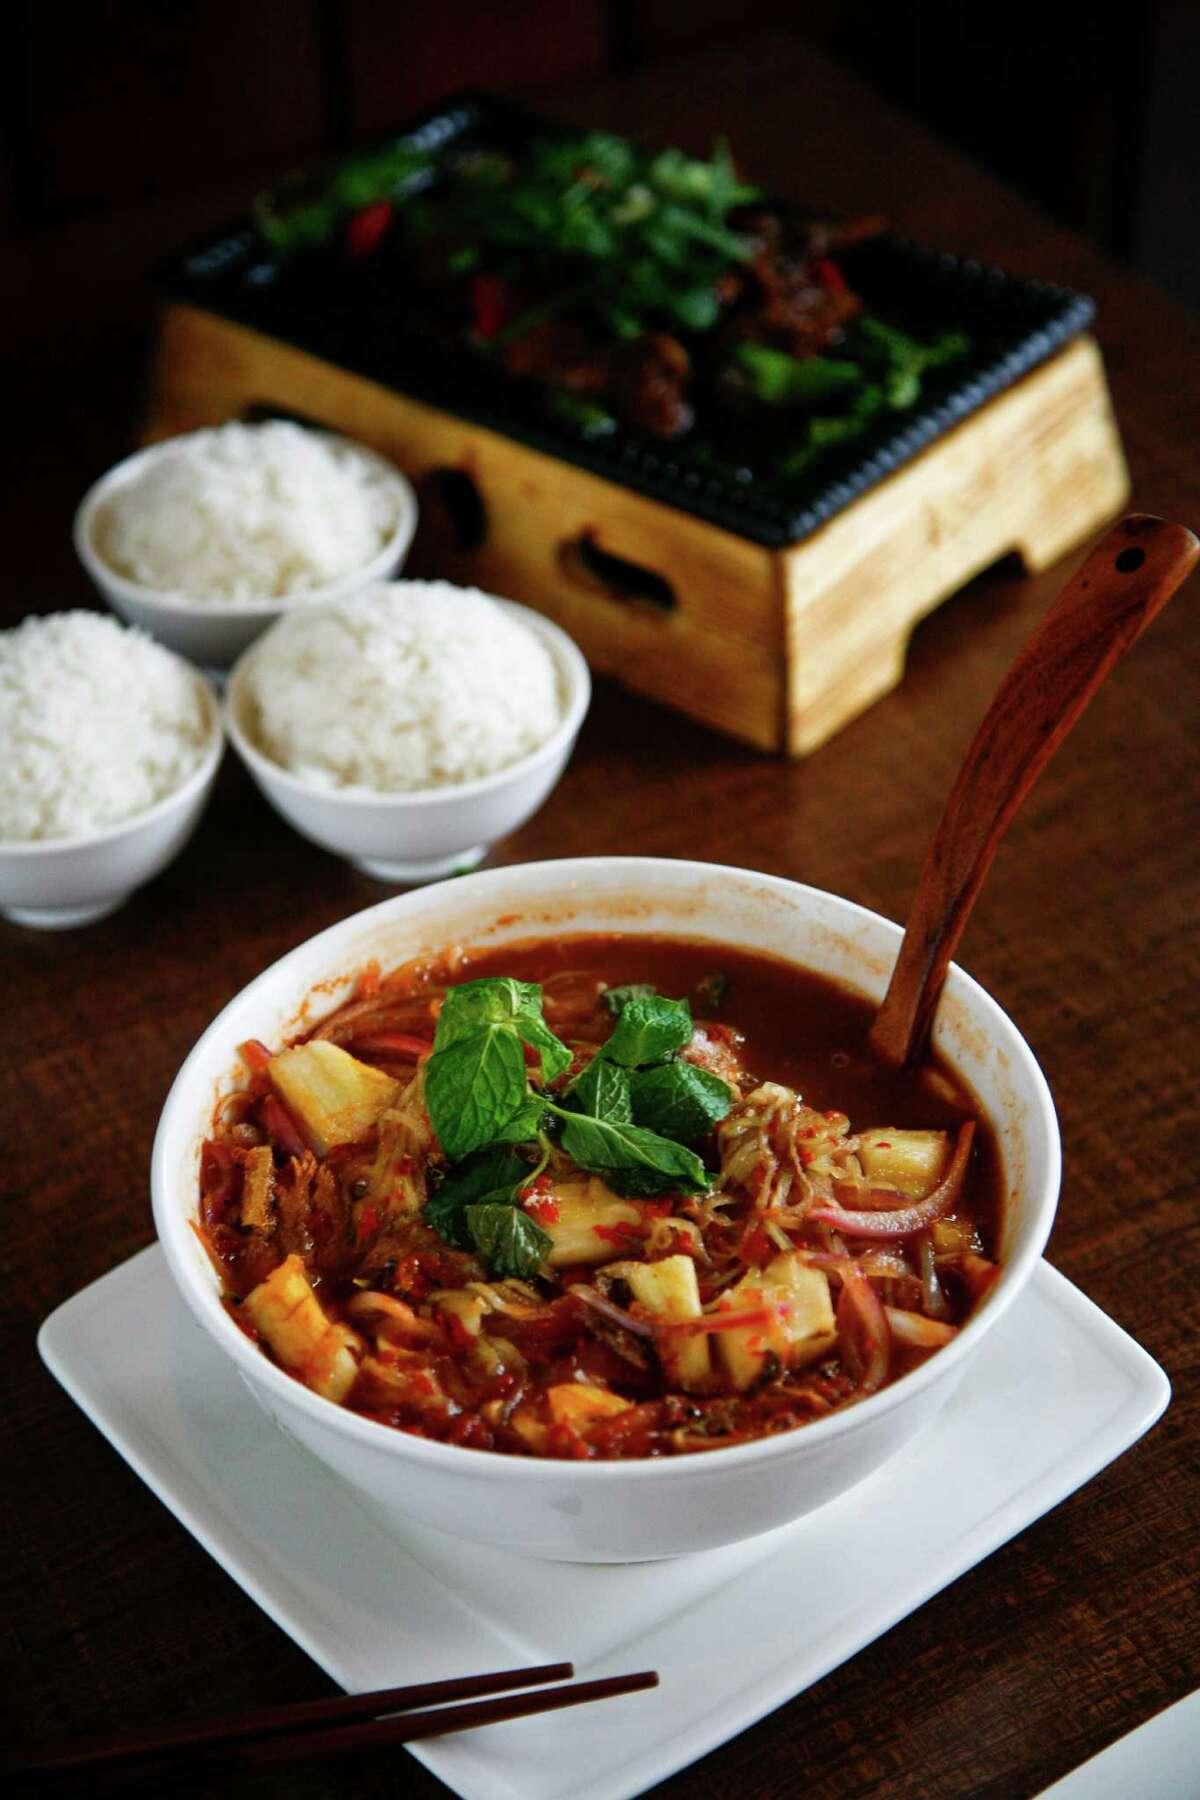 Penang Assam Laksa noodle soup at Banana Leaf Malaysian Cuisine